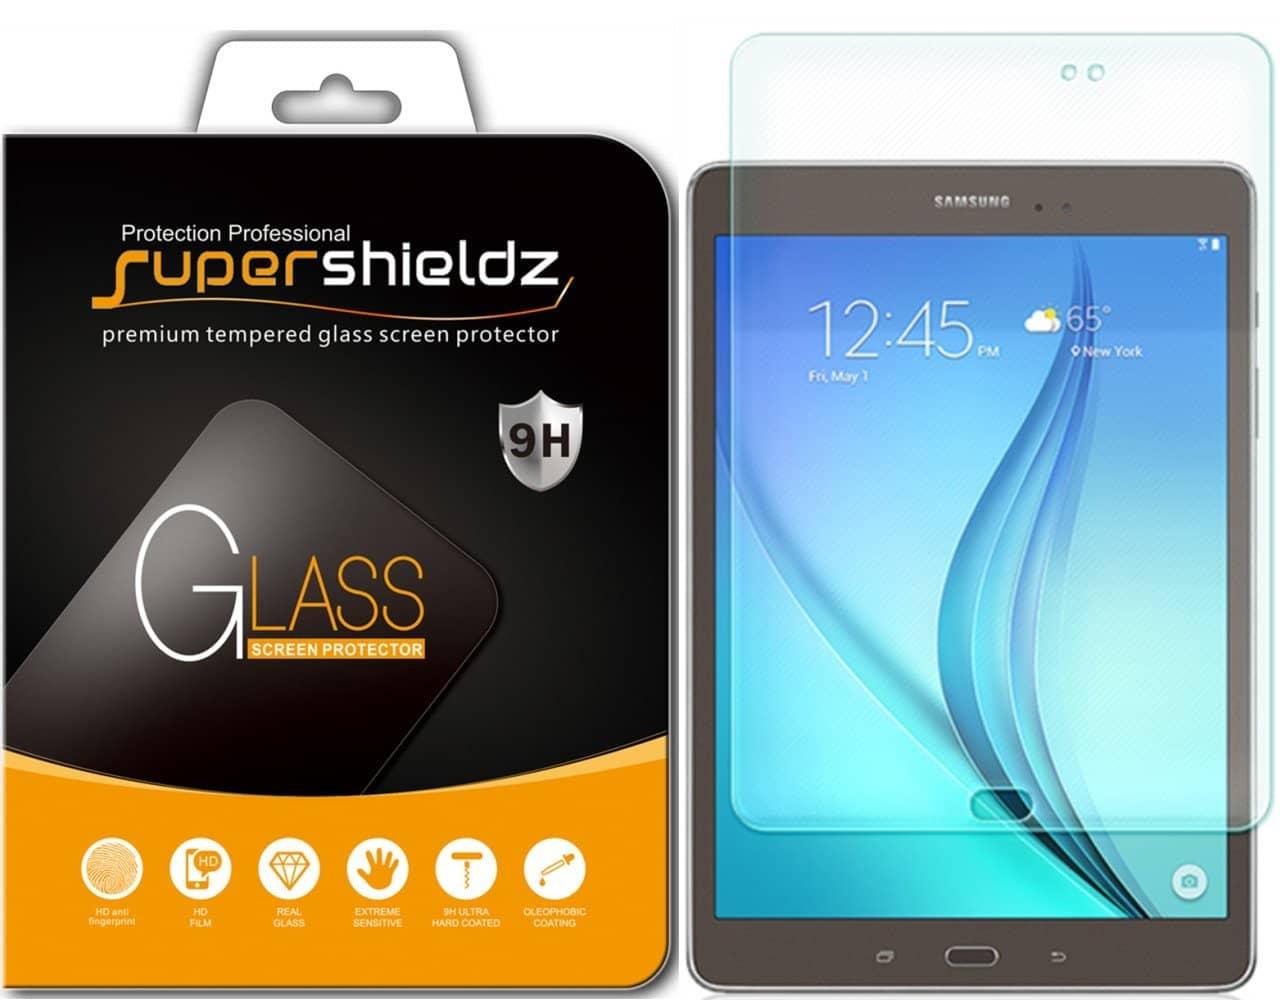 E Premium Tempered Glass Screen Protector Film Guard for Samsung Galaxy Tab A